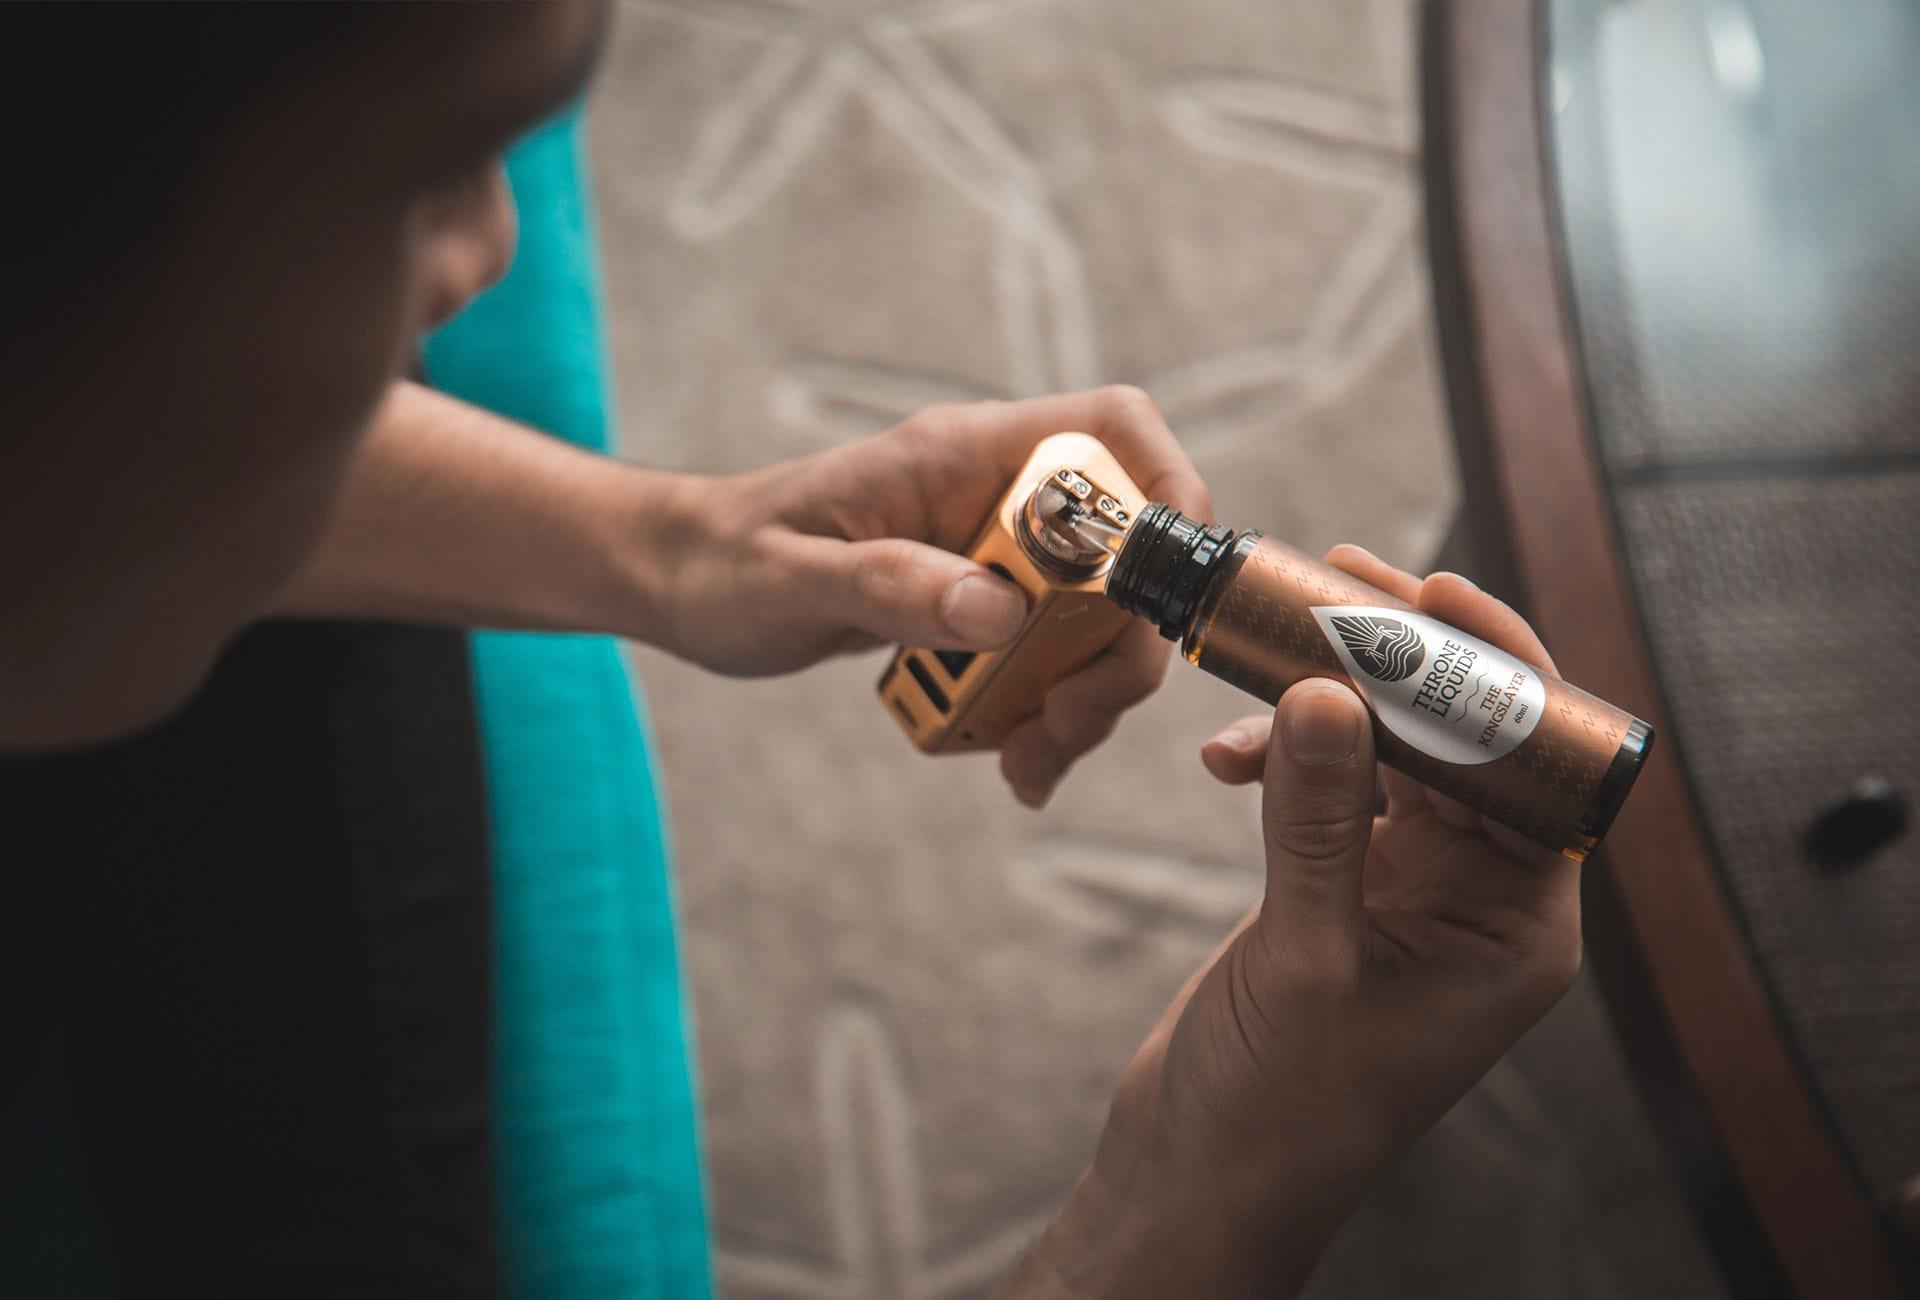 How Is Nicotine Measured In E-Liquid?